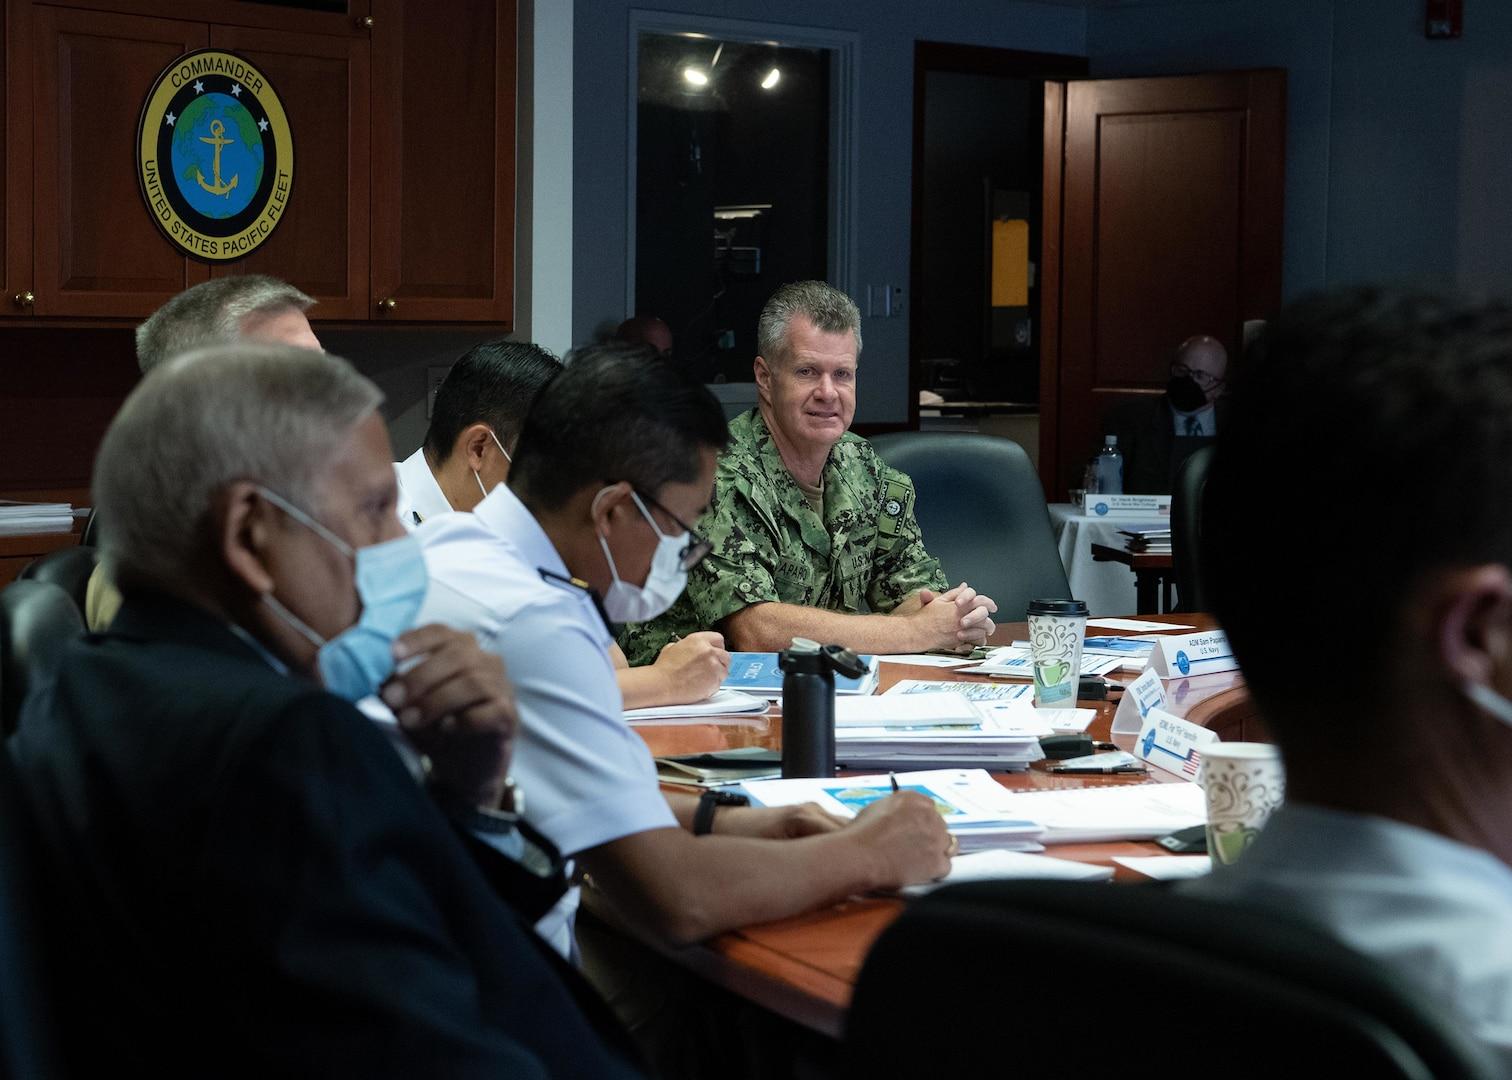 U.S. Pacific Fleet Hosts Combined Force Maritime Component Commander Course